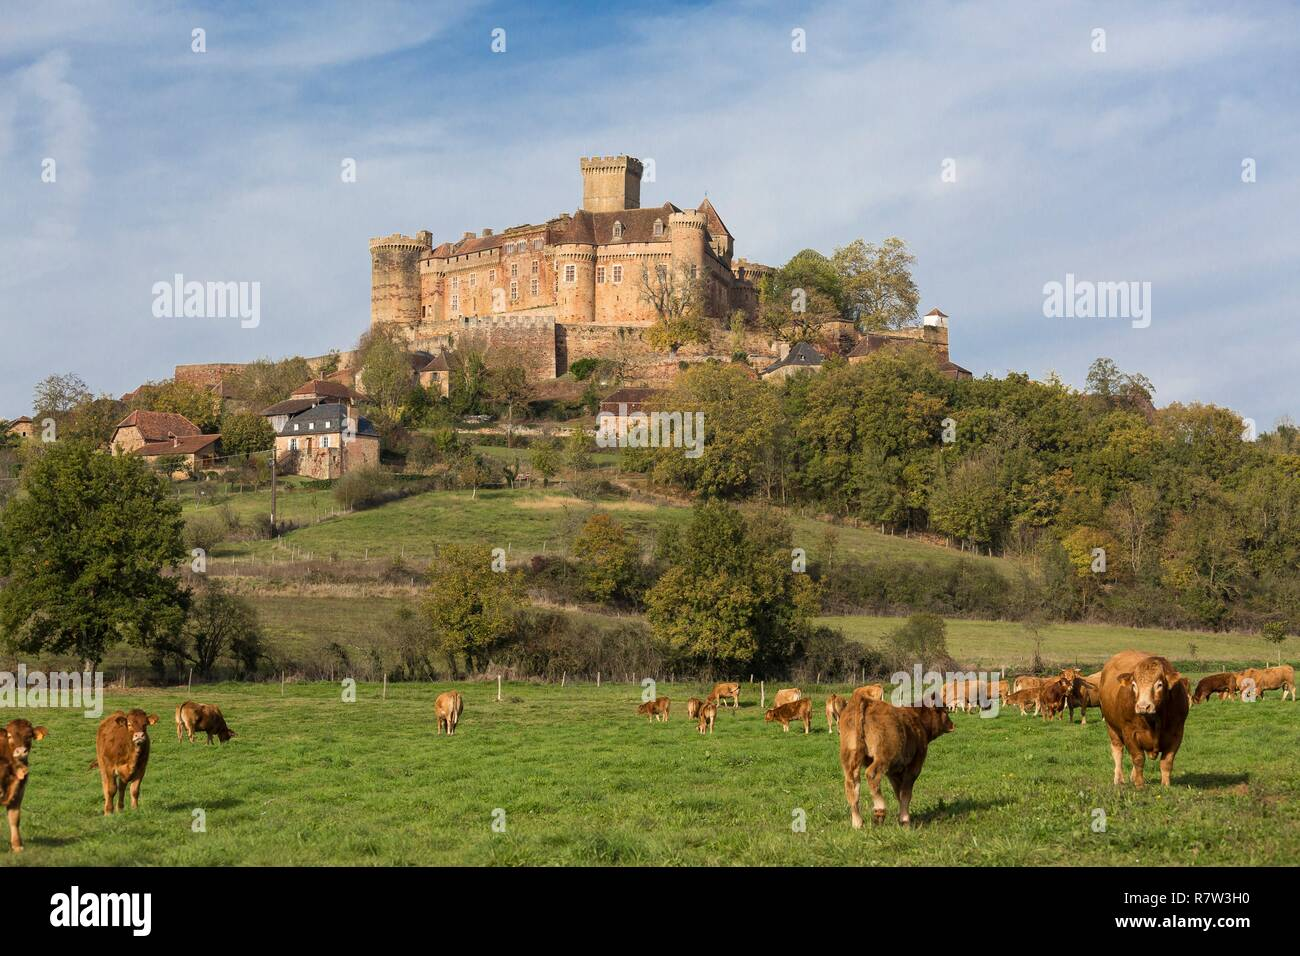 France, Lot, Prudhomat, Castelnau Bretenoux castle Stock Photo